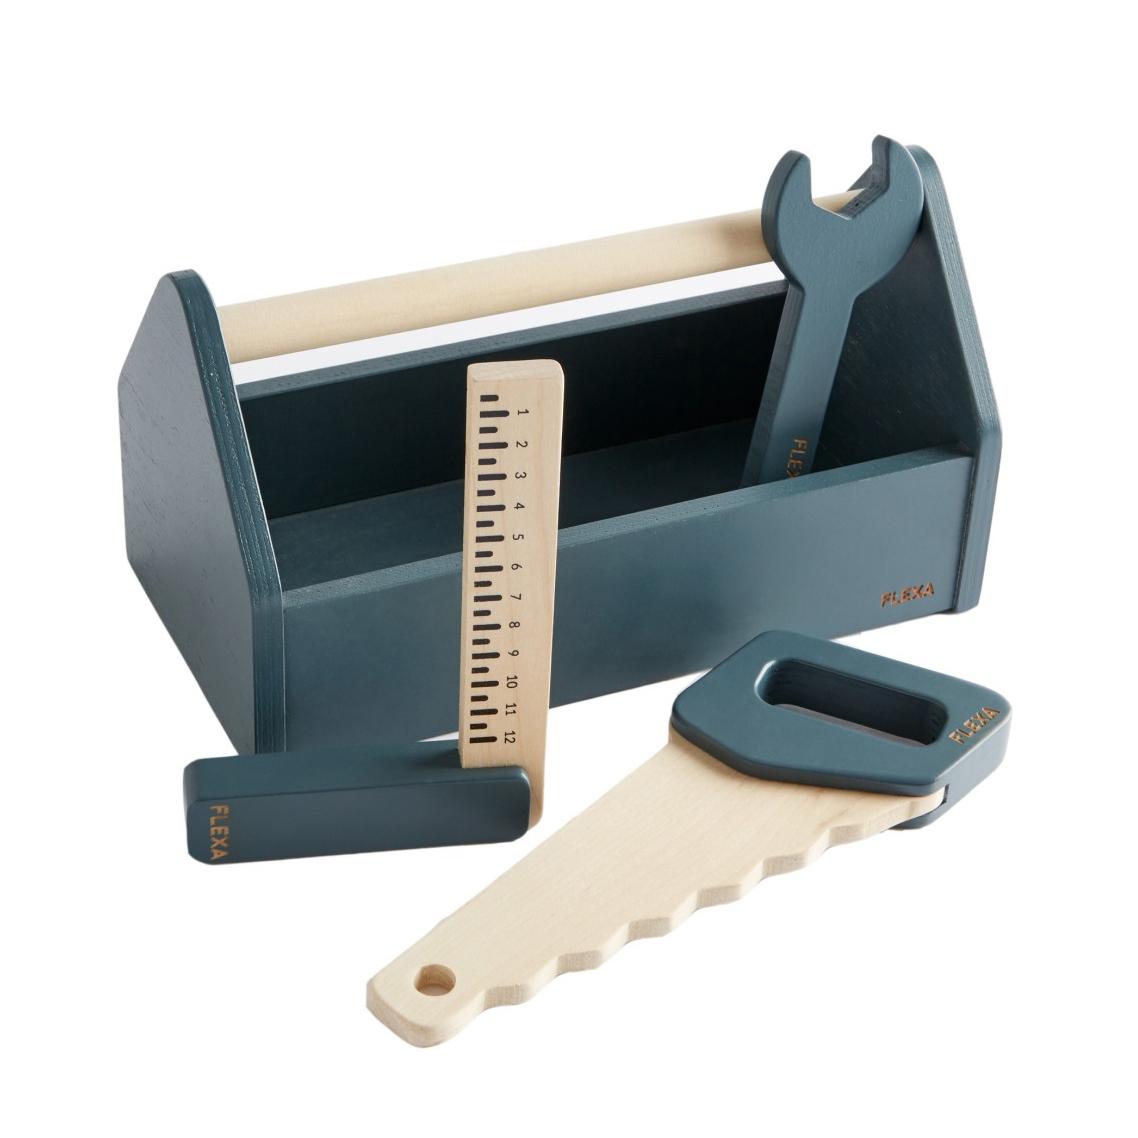 flexa-play-boite-outils-bois-jouet-imitation-cadeau